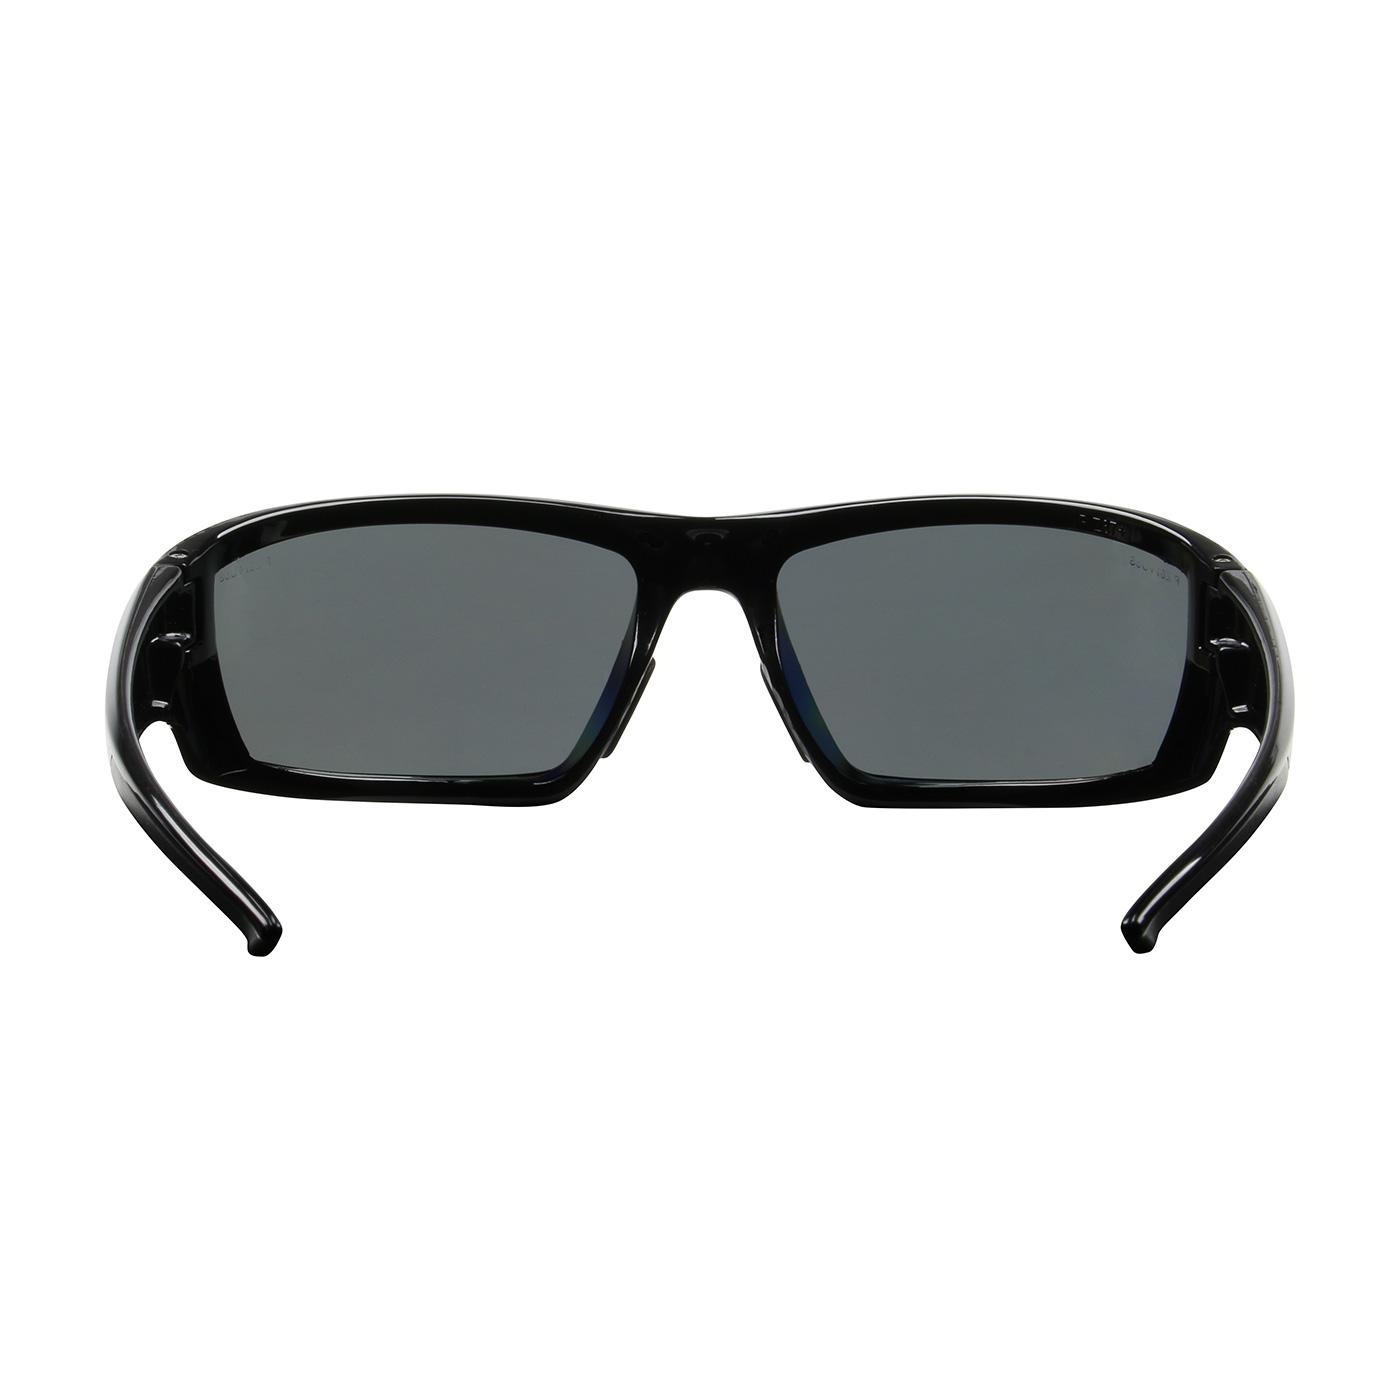 1795f447ee ... Eyewear Bouton Full Frame Sunburst. 1